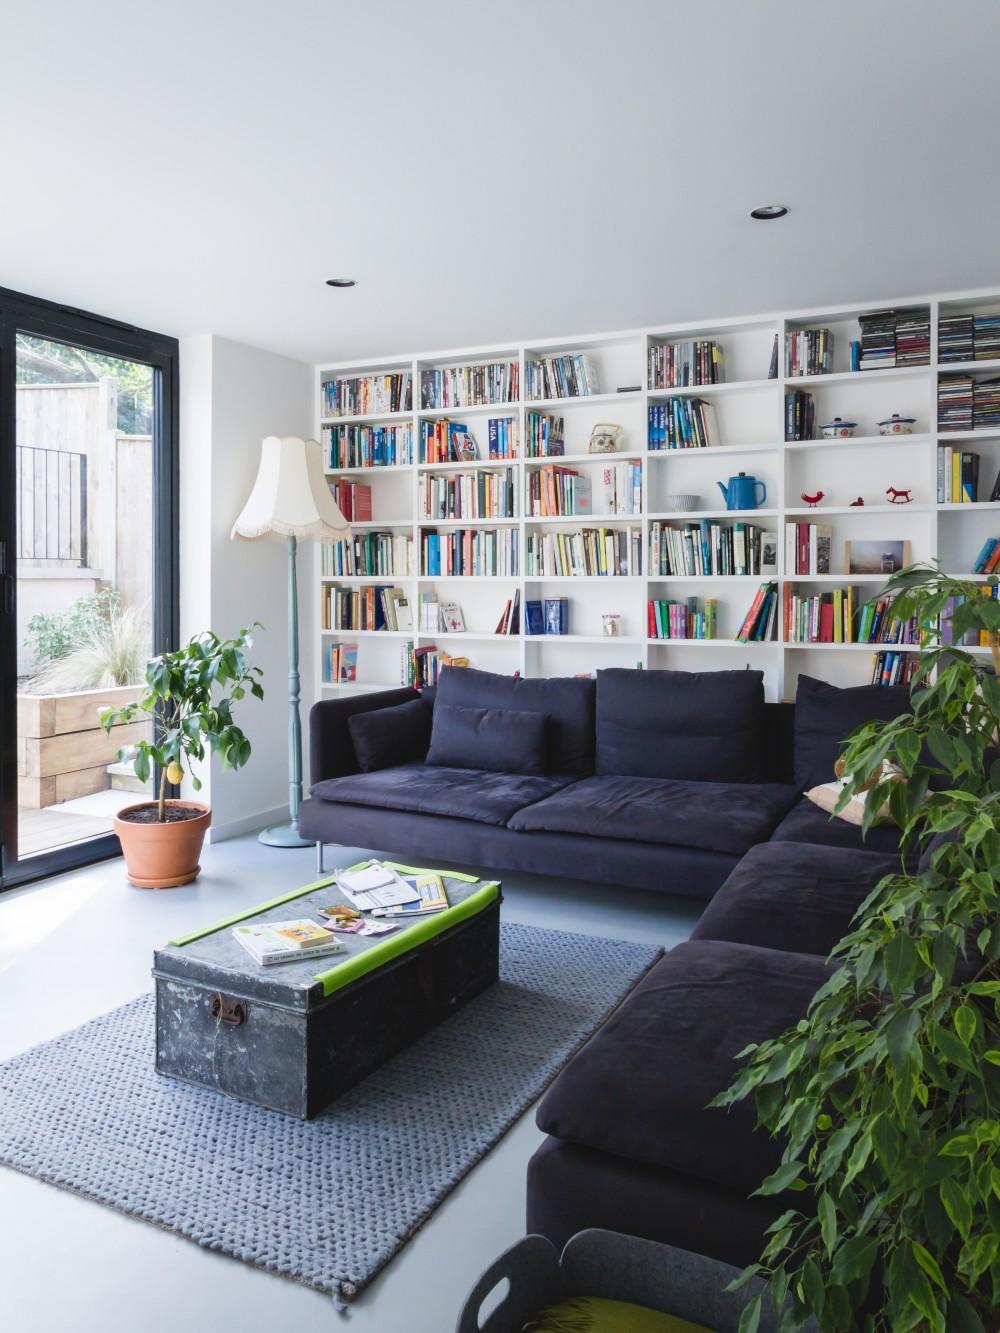 C17002-Fabre-deMarien Architectes-734